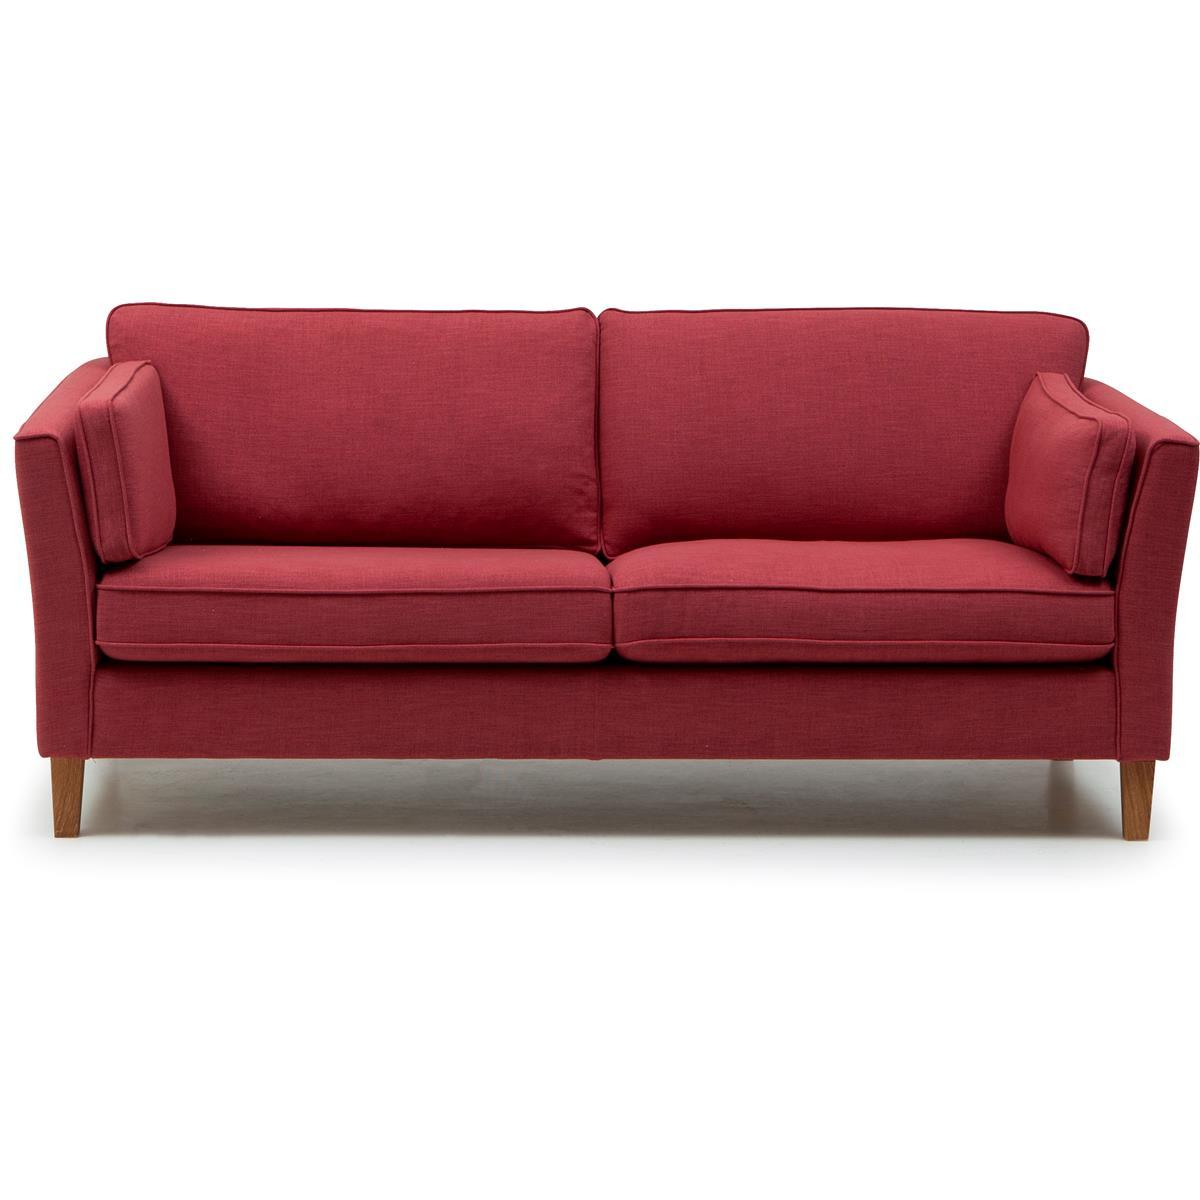 Carisma-soffa-3-sits-tyg-nordic-färg1-b